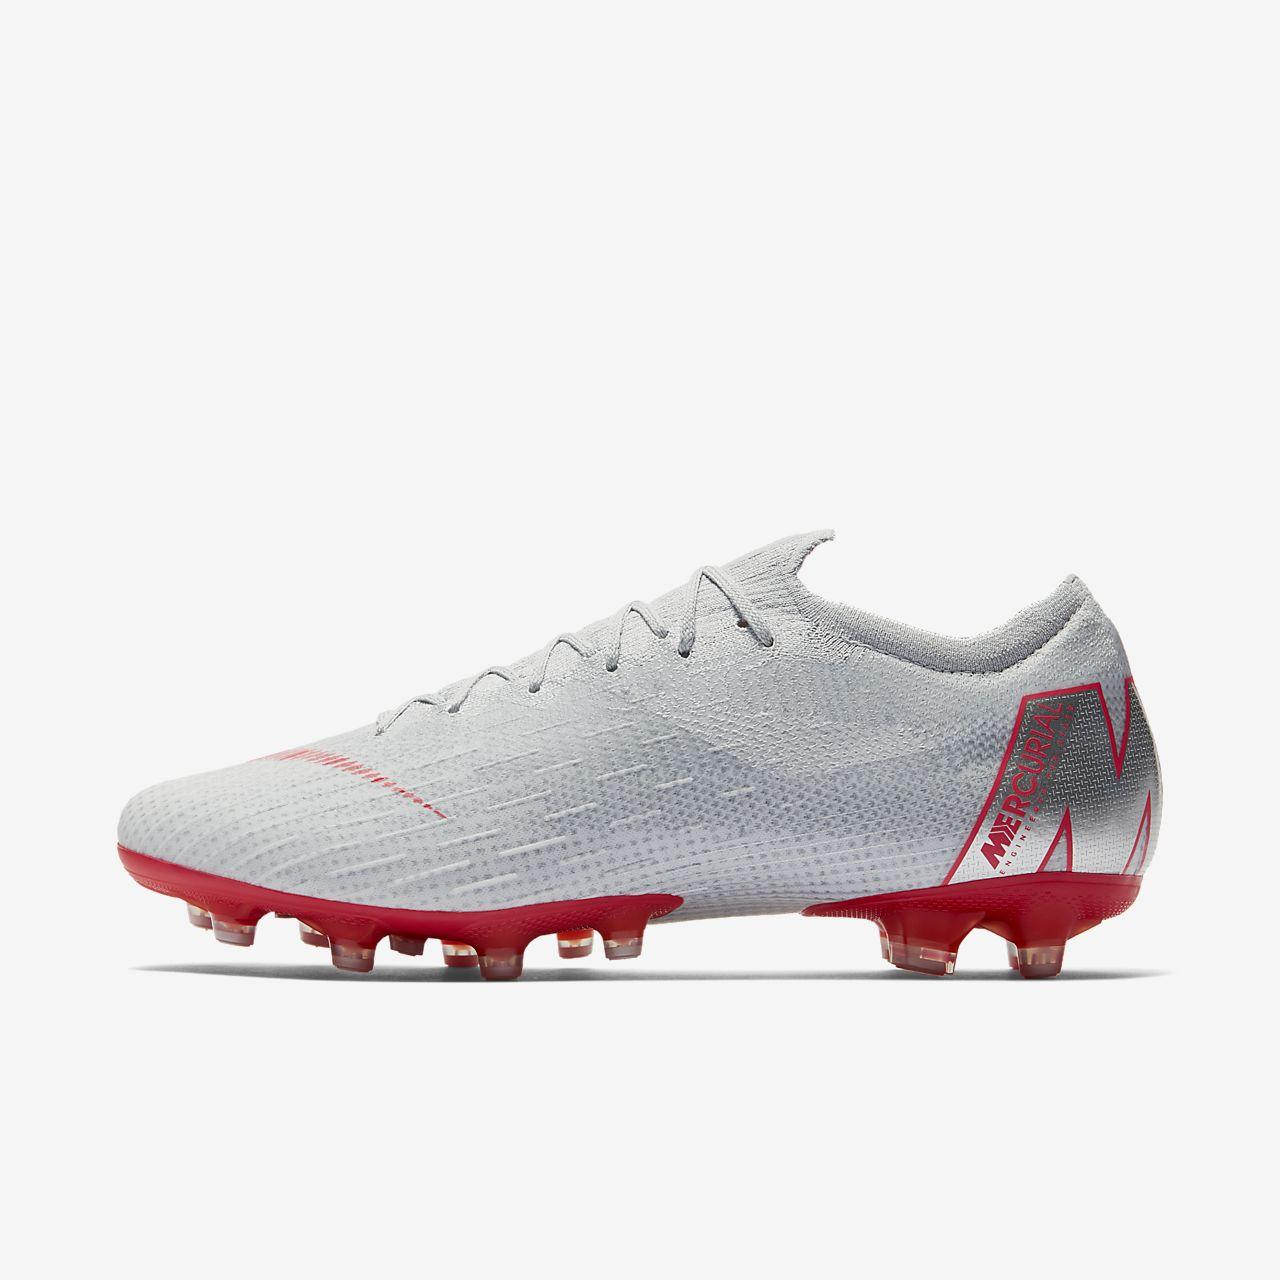 scarpe da calcio per bambini nike mercurial